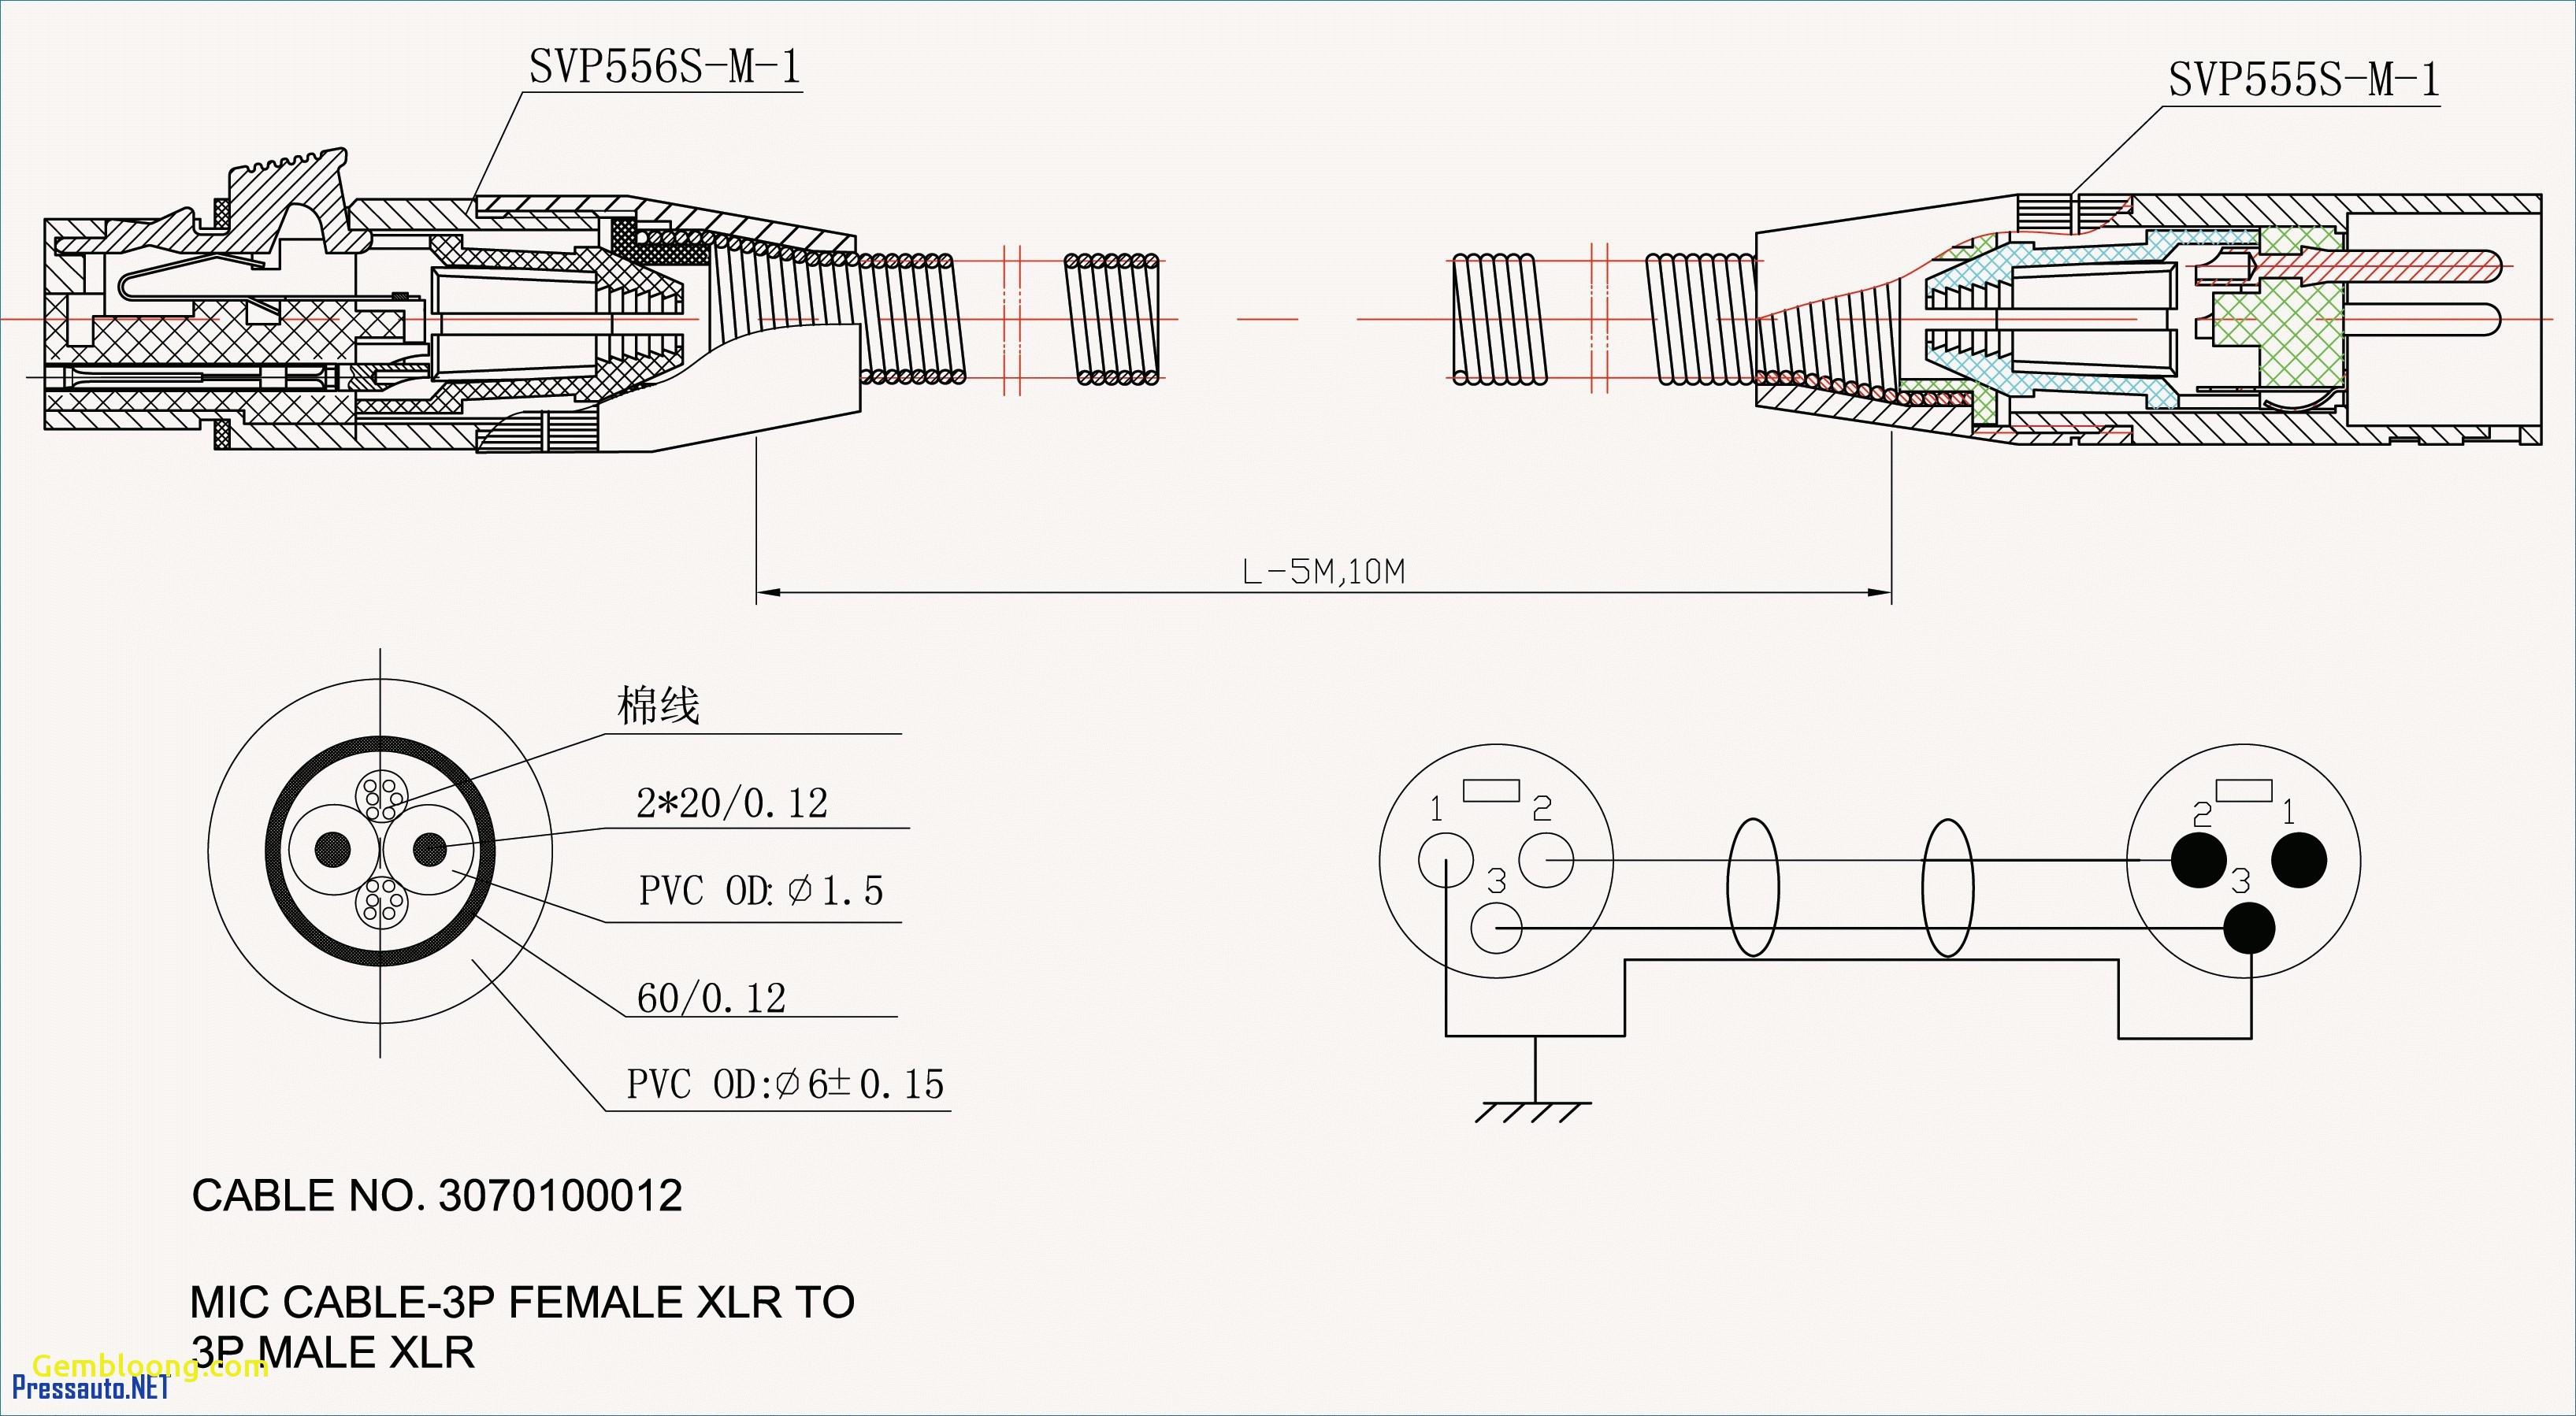 7 3 Powerstroke Engine Diagram 2 ford 6 0l Engine Diagram Schema Wiring Diagram